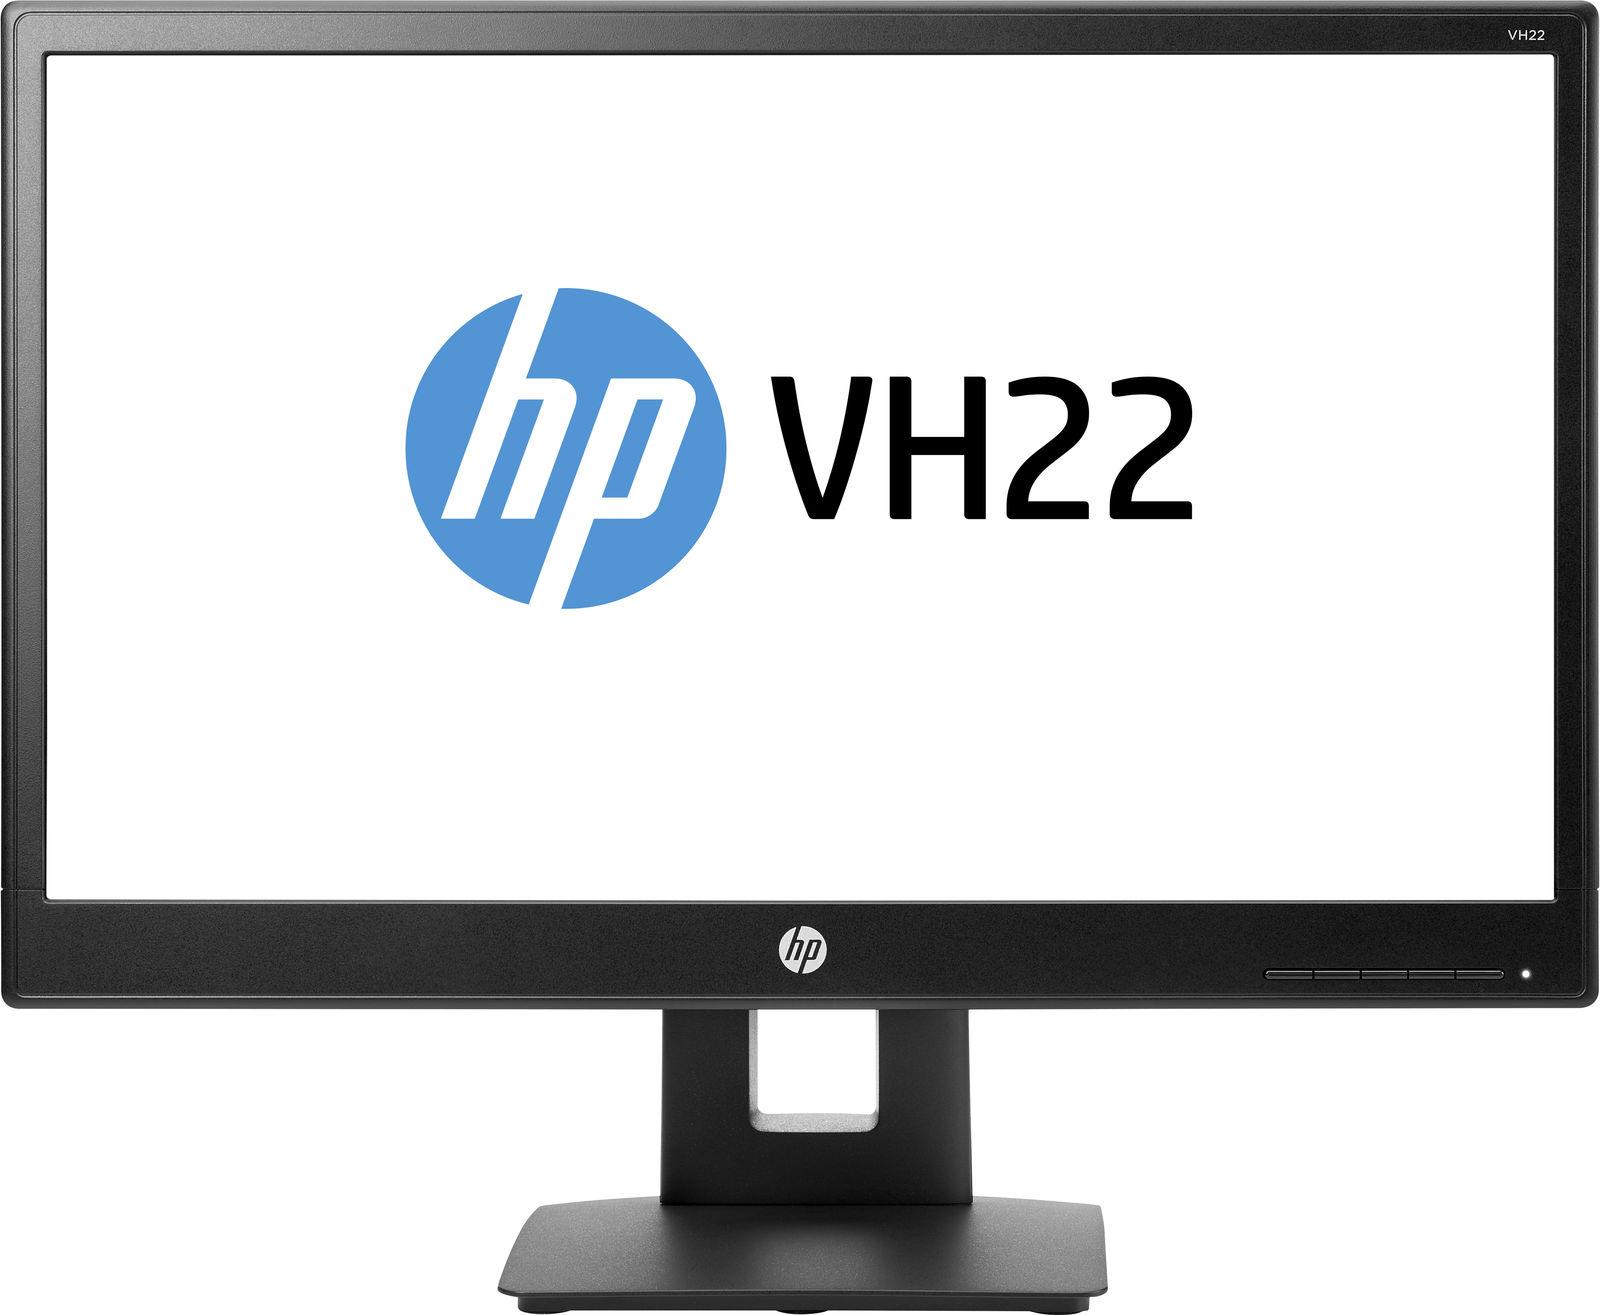 "HP VH22 computer monitor 54.6 cm (21.5"") Full HD LED Flat Black"